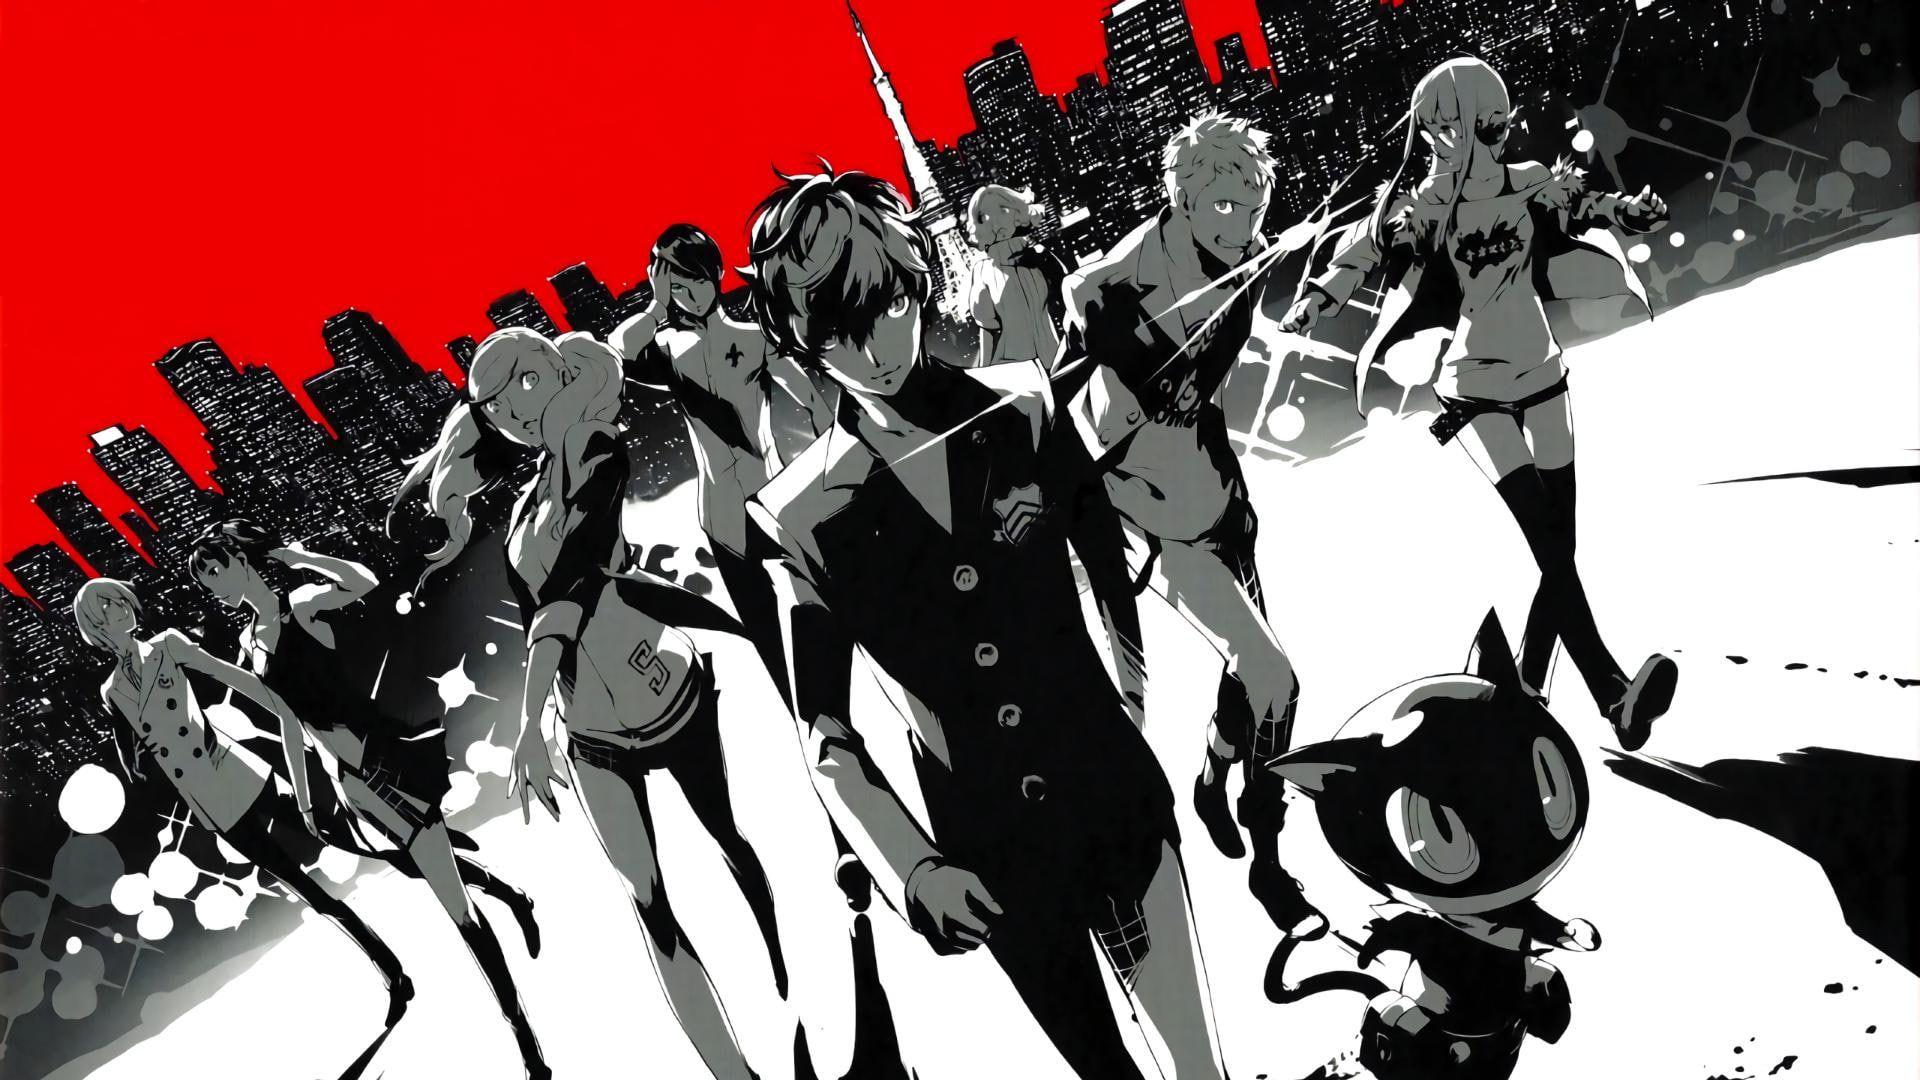 Phantom Thieves Persona Series Persona 5 Protagonist Persona 5 1080p Wallpaper Hdwallpaper Desktop In 2020 Persona 5 Digital Wallpaper Persona